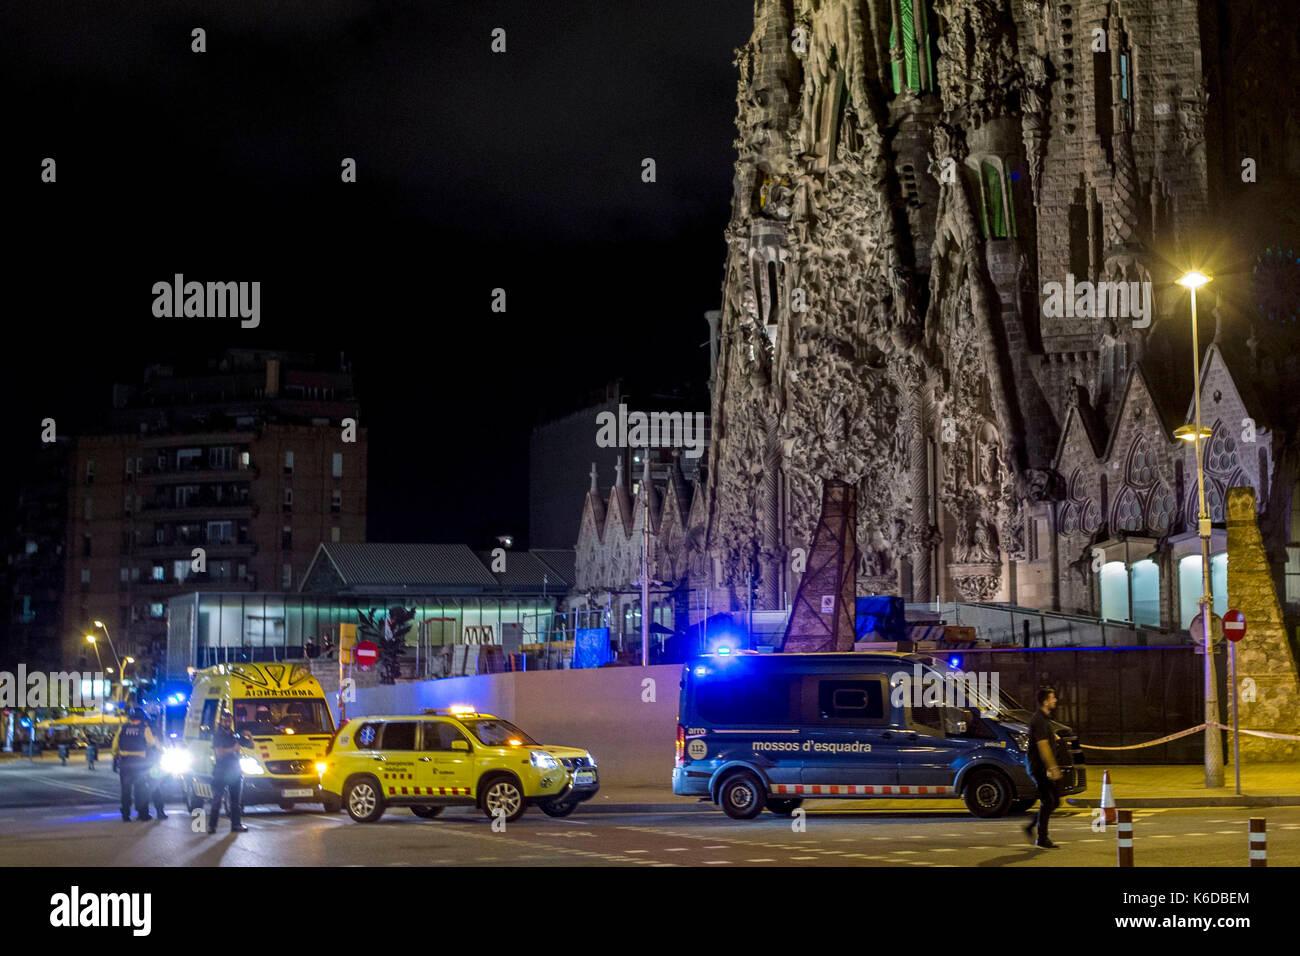 Authorities watch the perimeter of the Sagrada Familia after a terrorist alert in Barcelona, Catalonia, Spain, 12 - Stock Image